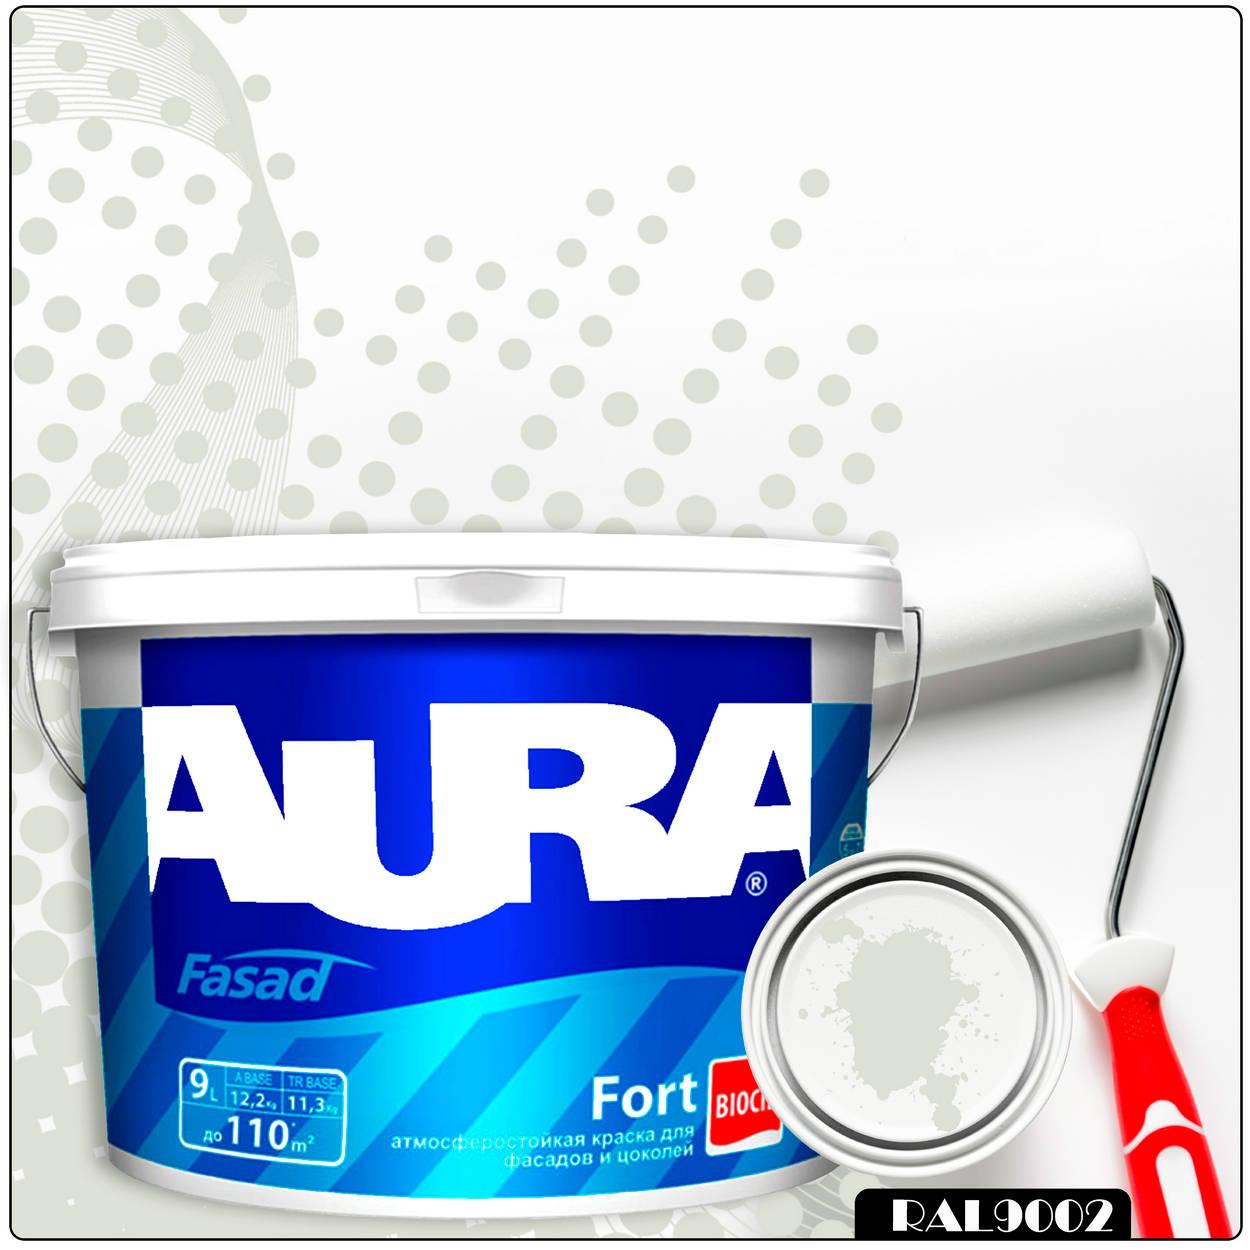 Фото 2 - Краска Aura Fasad Fort, RAL 9002 Серо-белый, латексная, матовая, для фасада и цоколей, 9л, Аура.